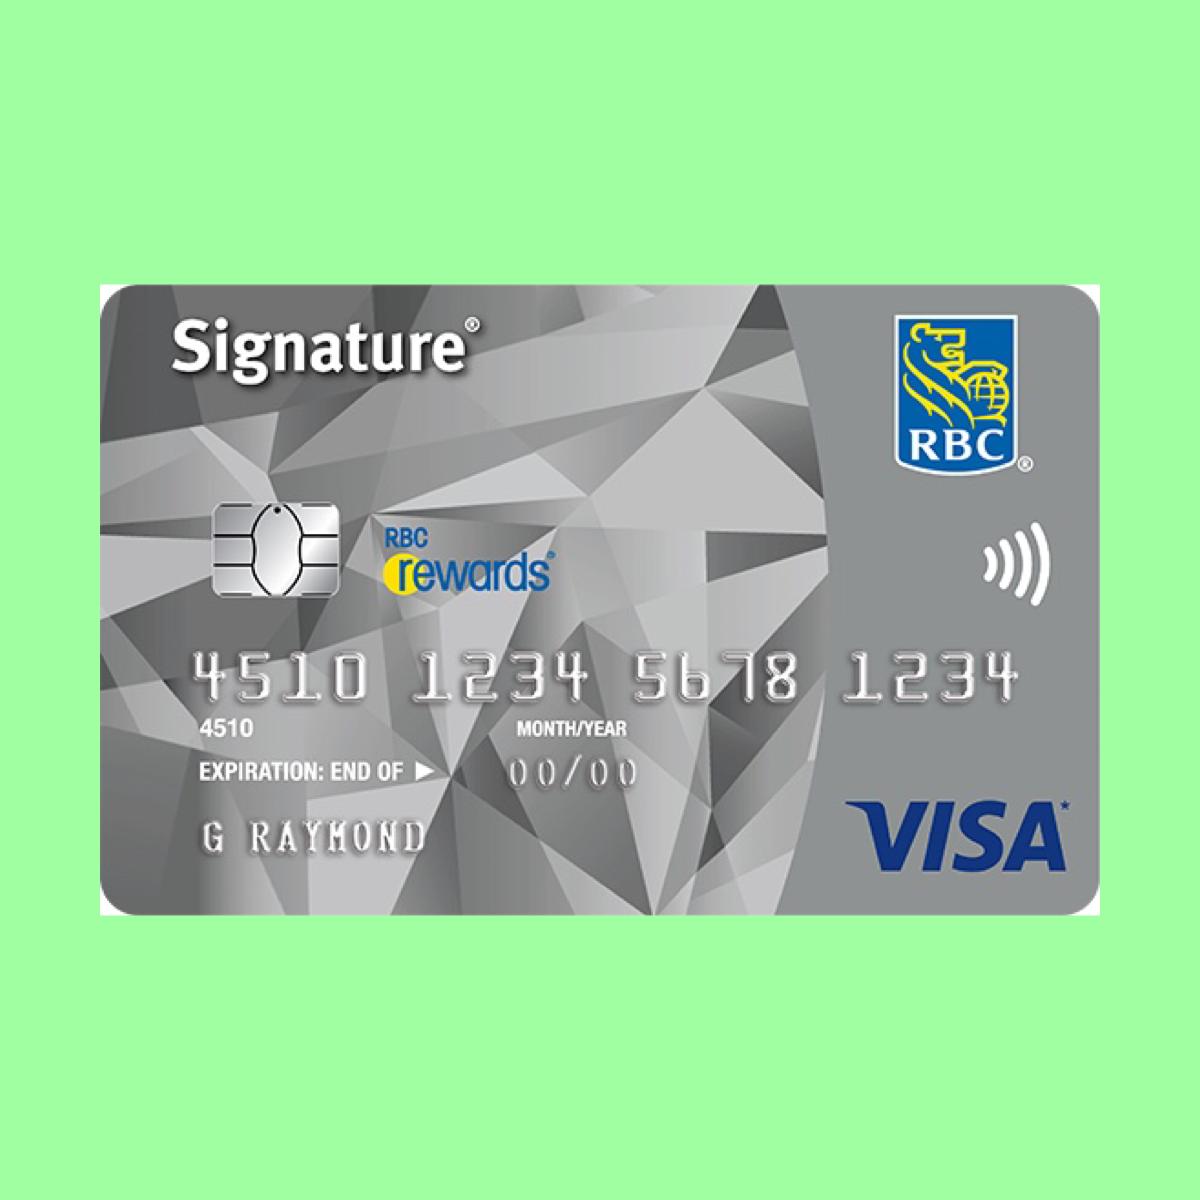 Signature Rbc Rewards Visa The Point Calculator Visa Card Visa Reward Card